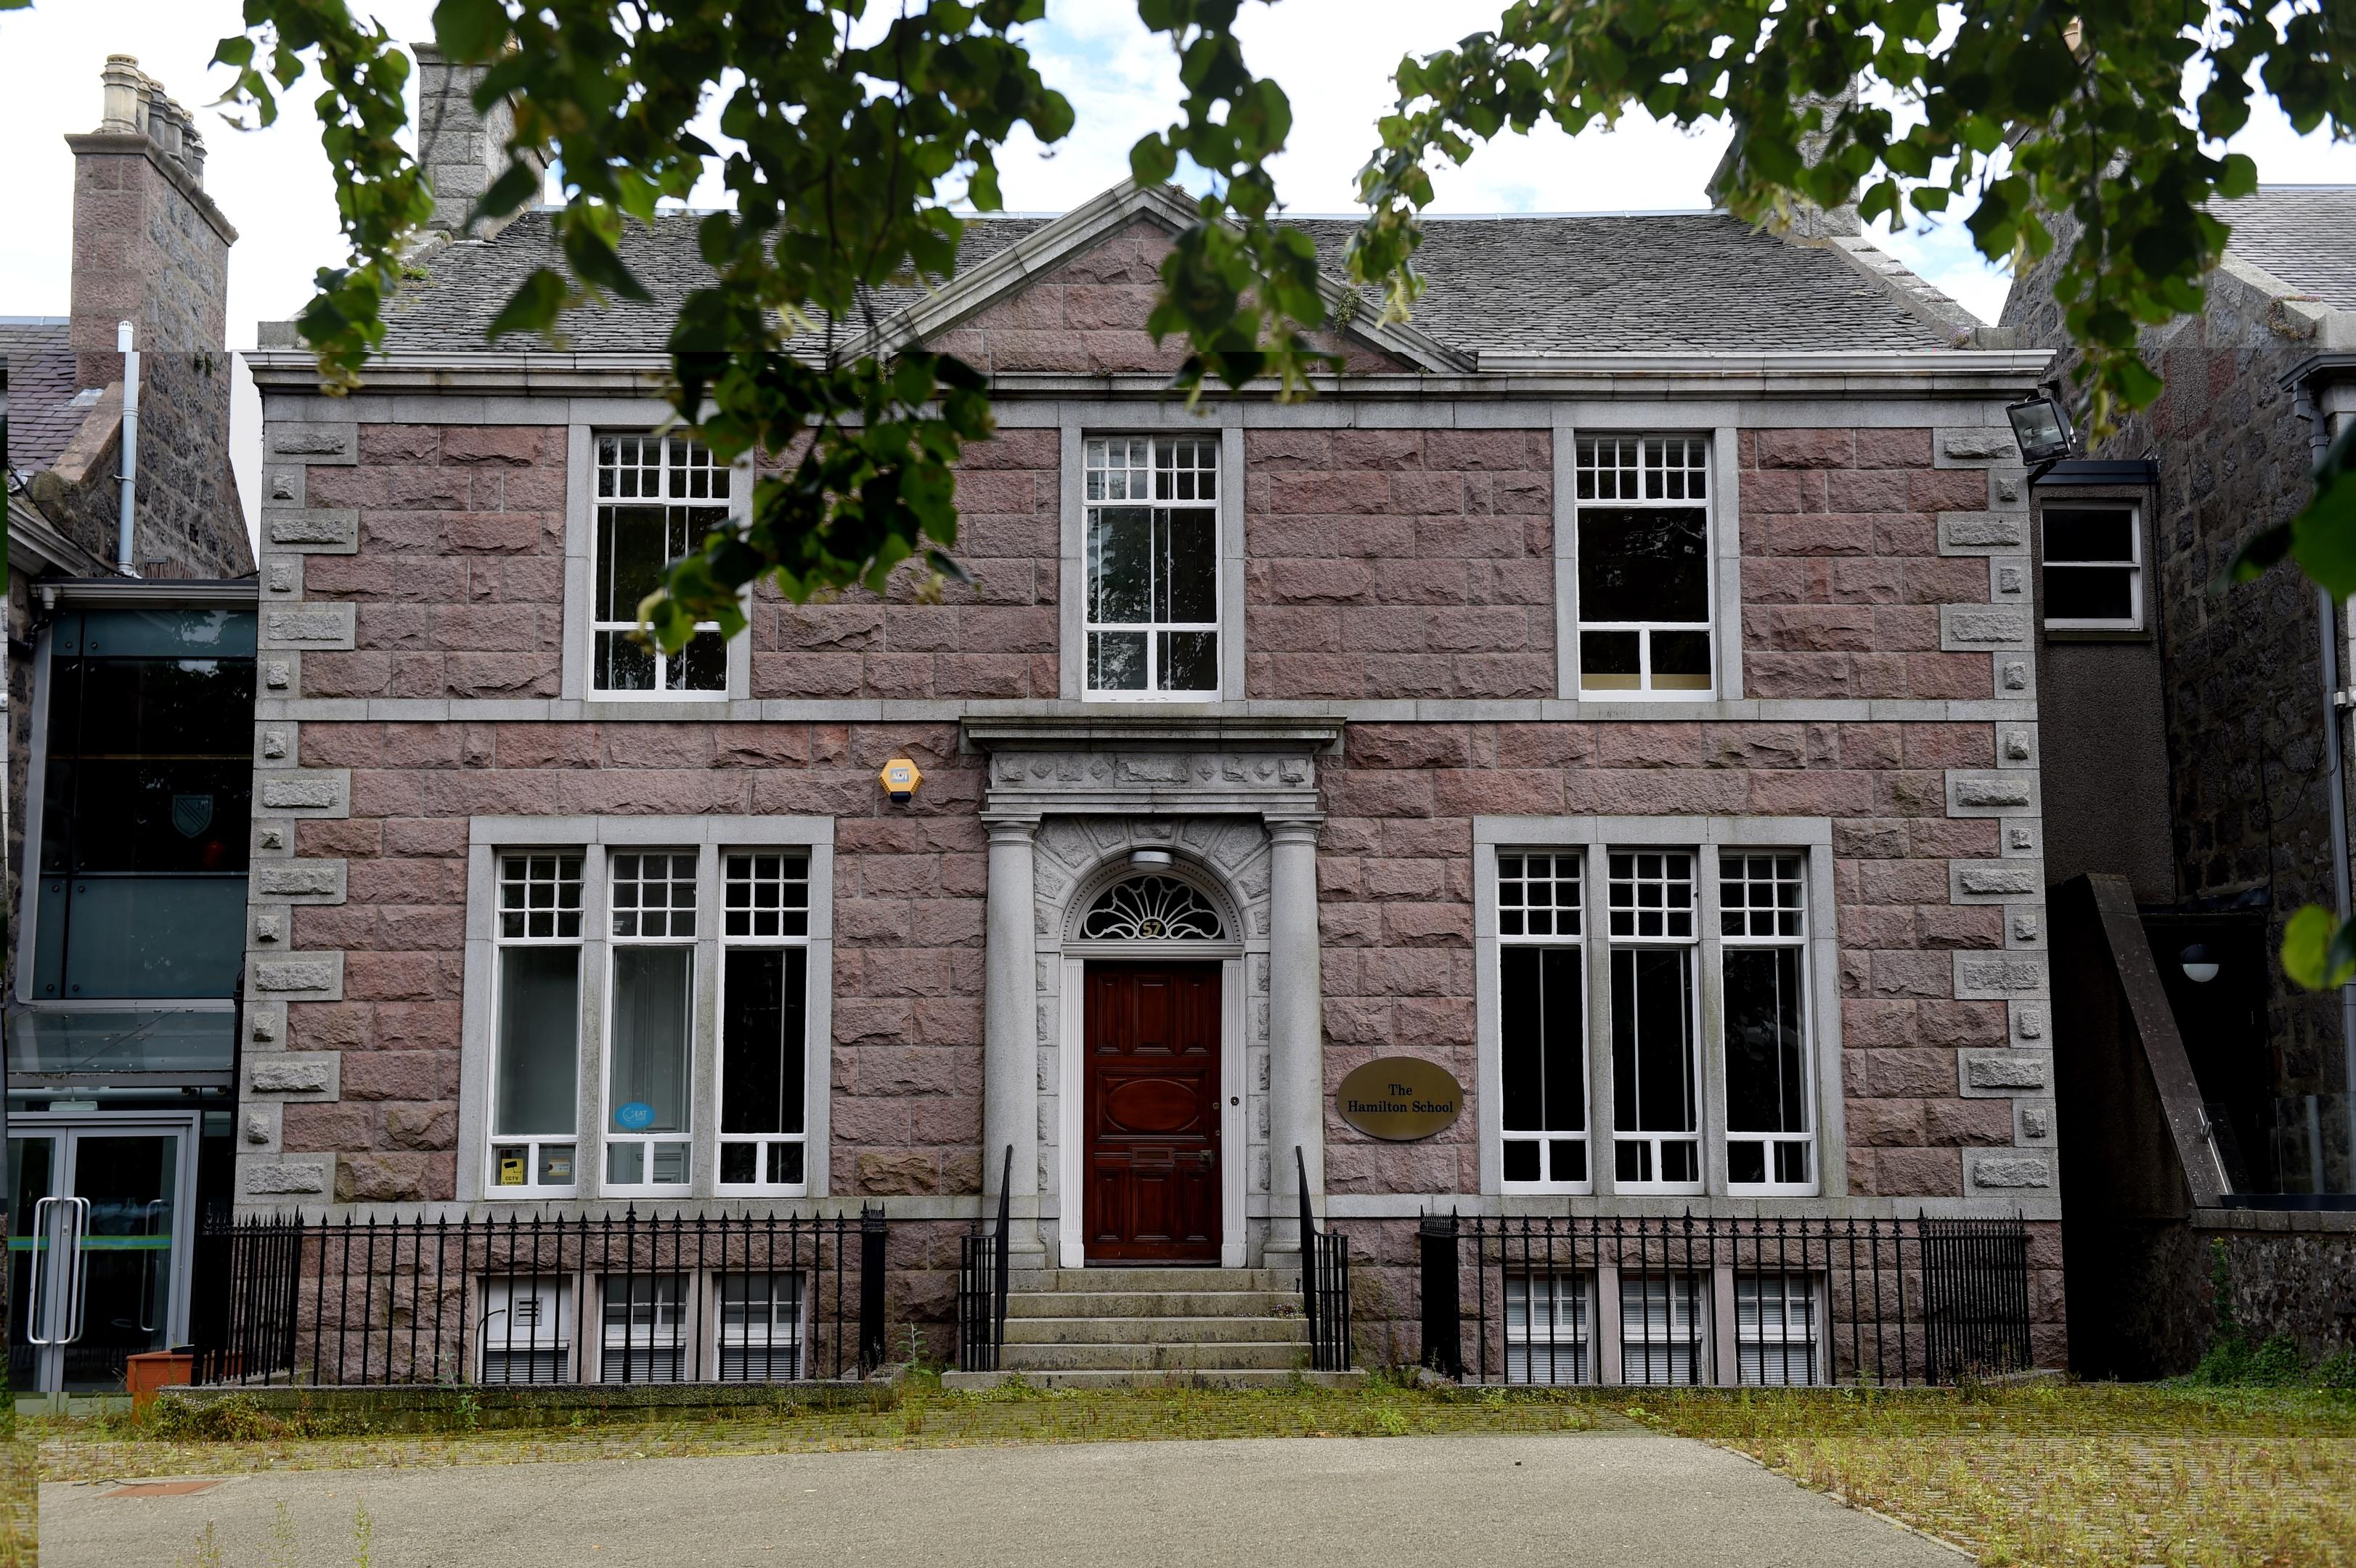 The former Hamilton School